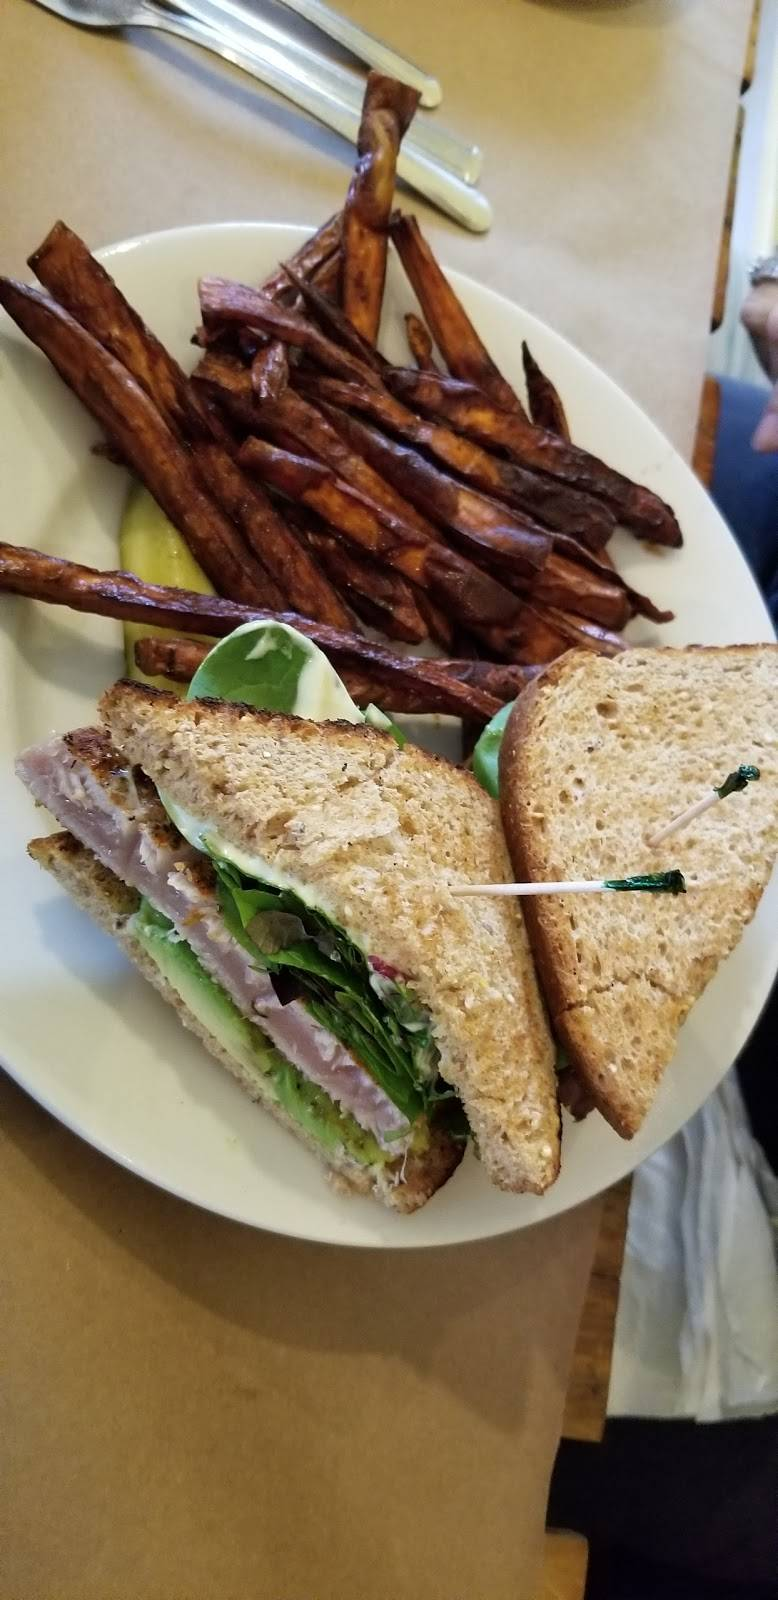 Local Urban Kitchen   restaurant   1805 NJ-35, Point Pleasant Beach, NJ 08702, USA   8482323451 OR +1 848-232-3451